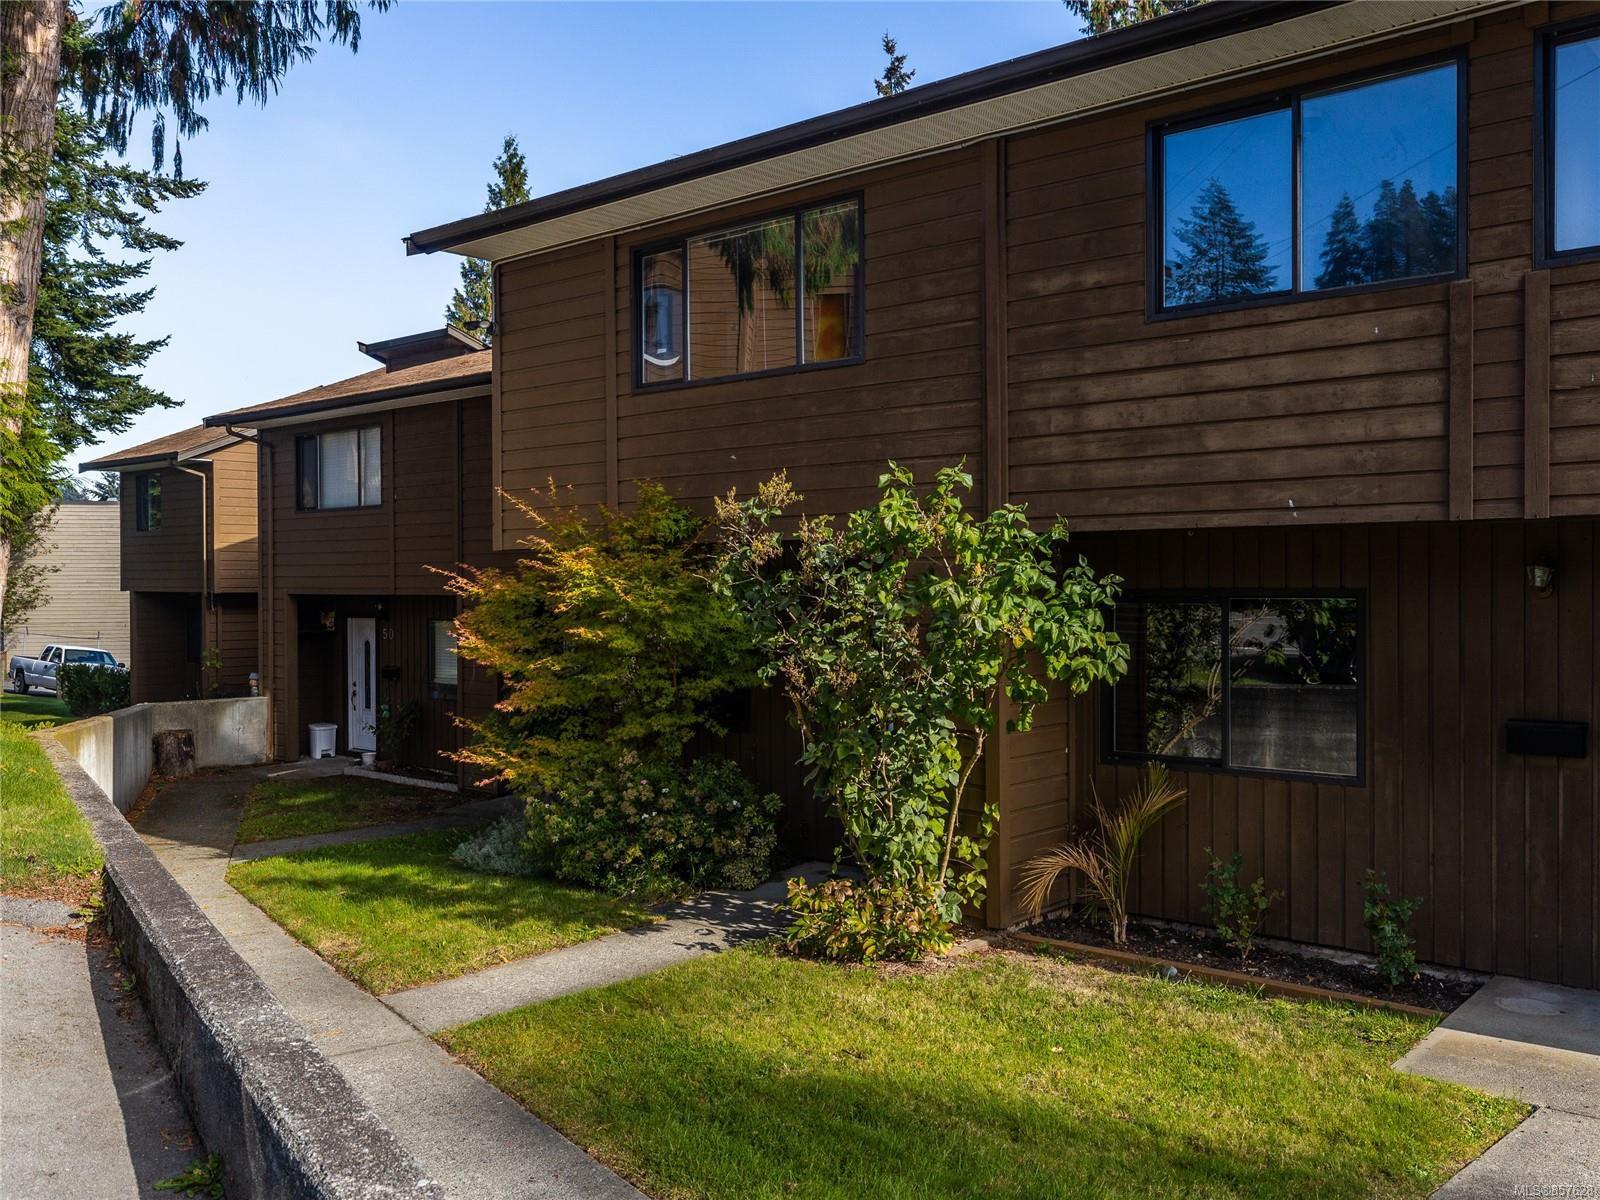 Main Photo: 48 855 HOWARD Ave in : Na South Nanaimo Row/Townhouse for sale (Nanaimo)  : MLS®# 857628